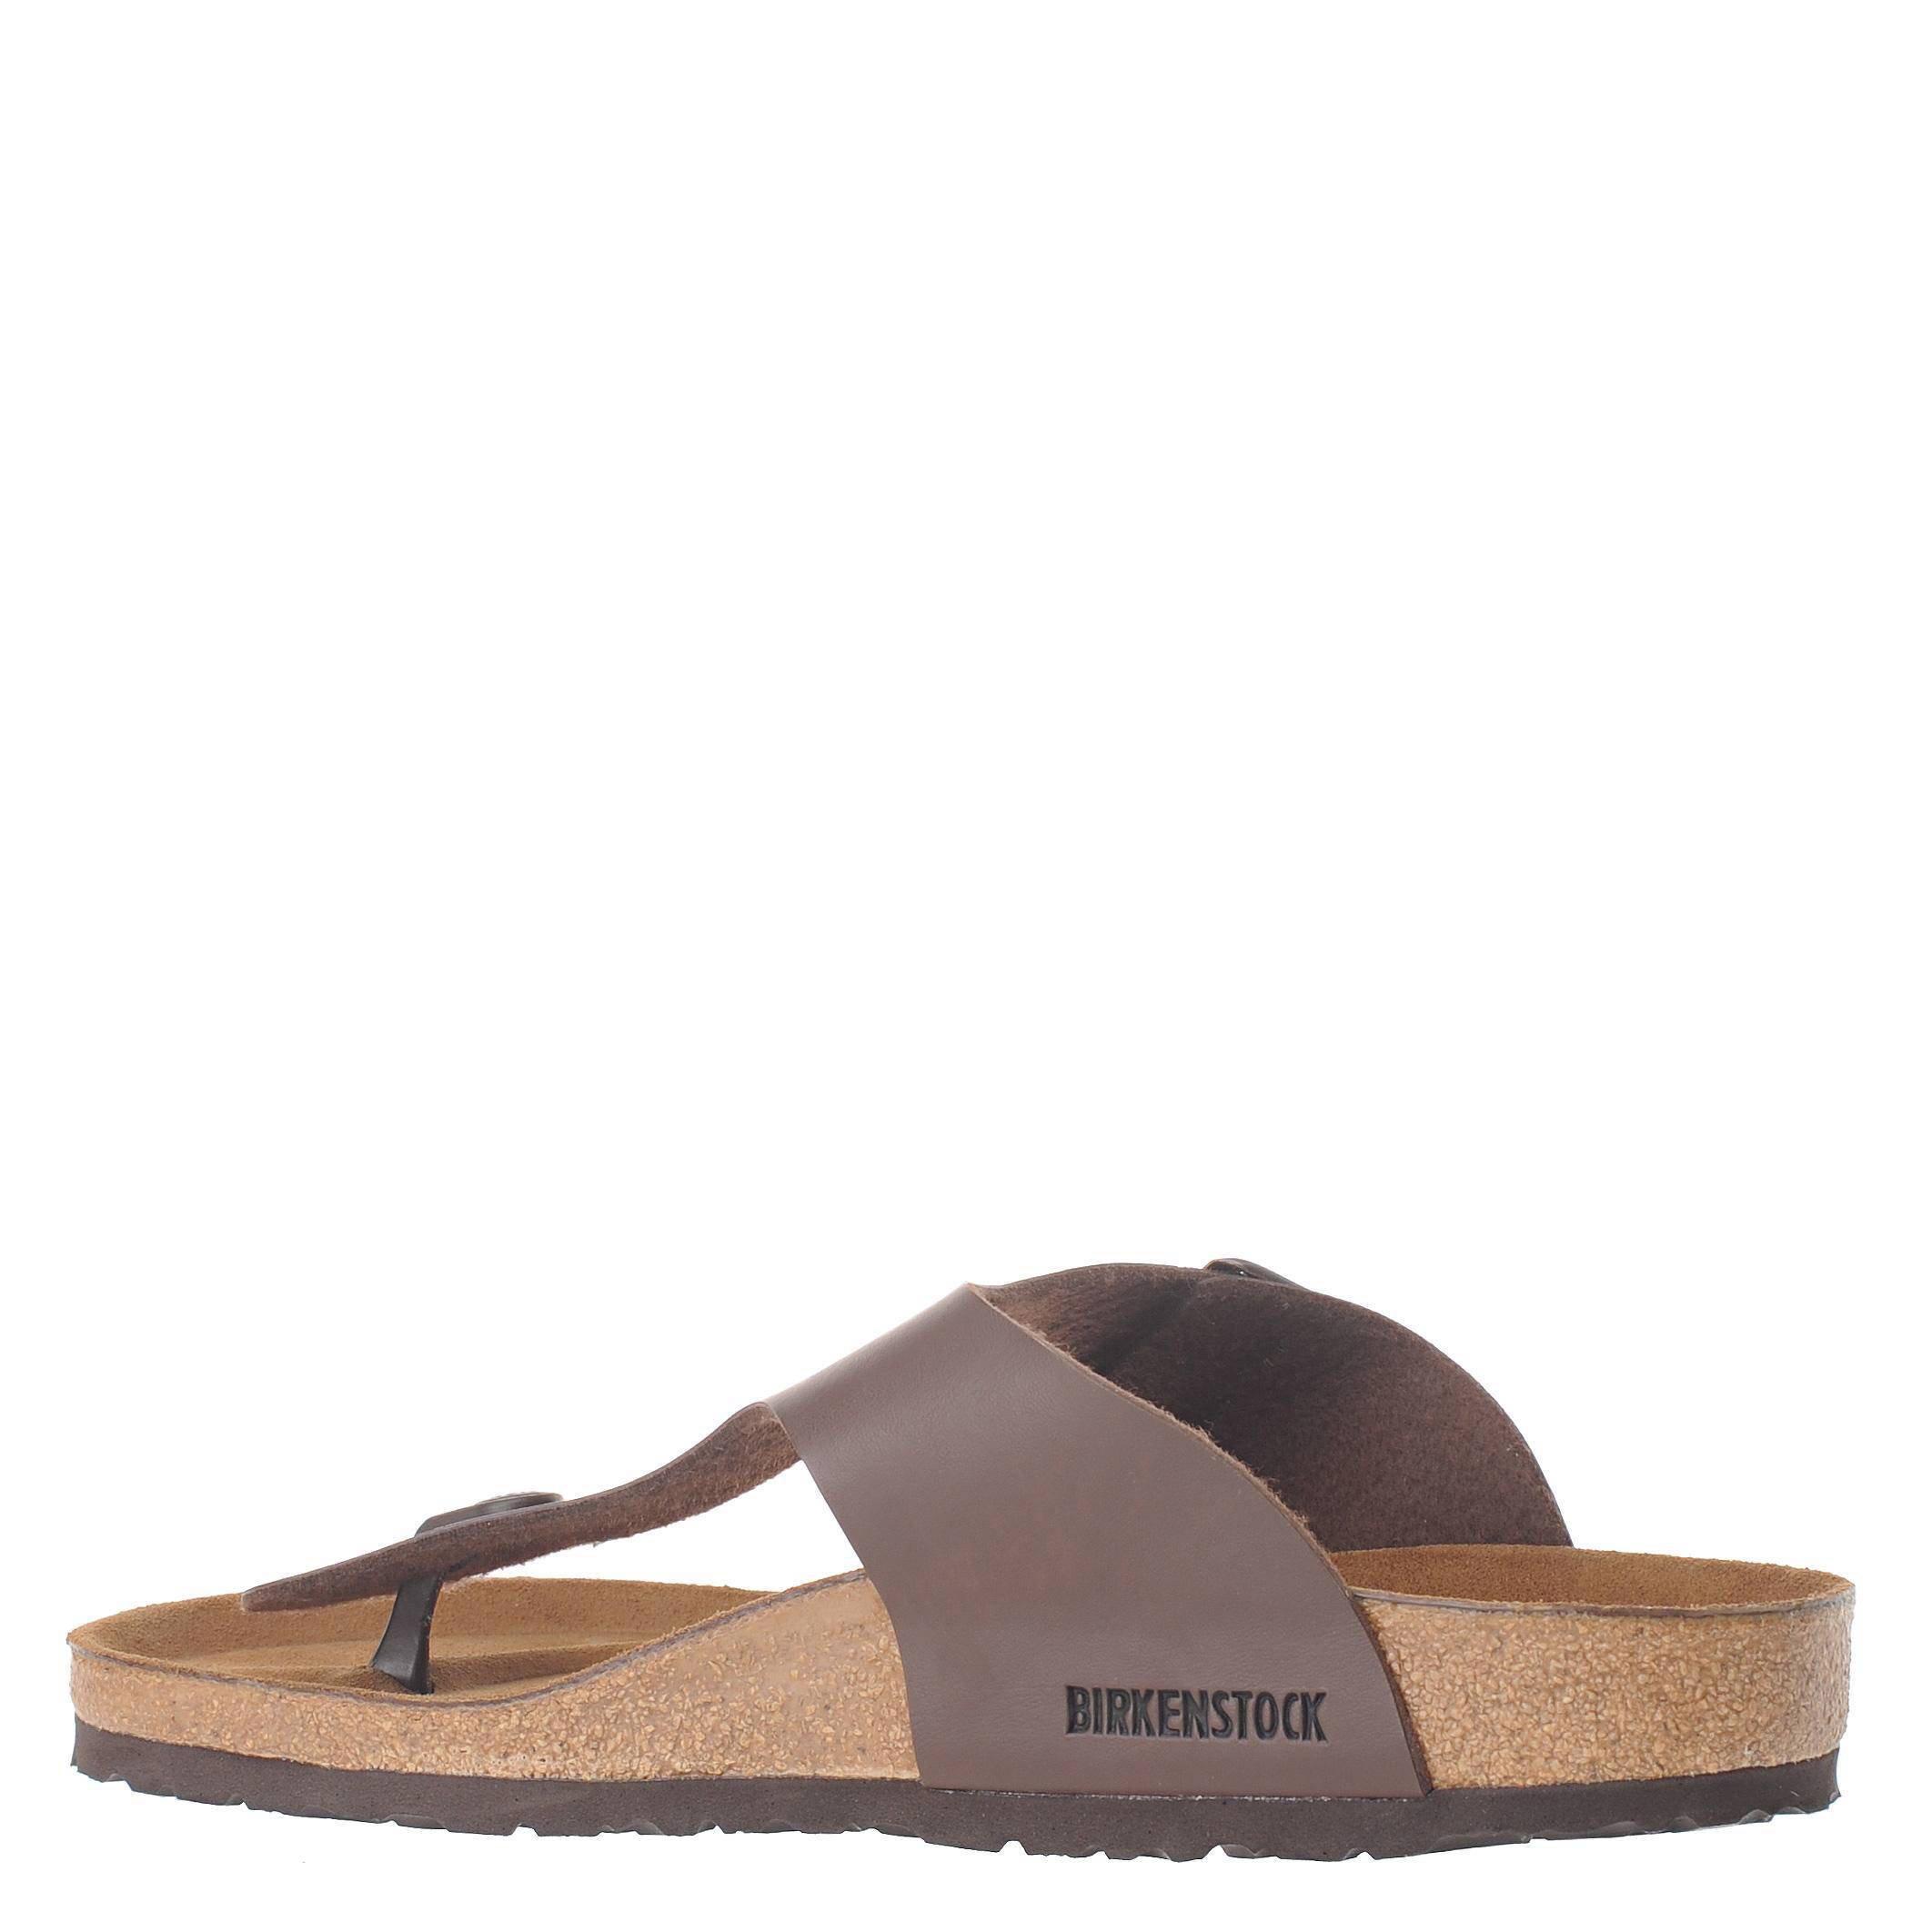 0916e5608f6 Birkenstock Ramses slippers   wehkamp